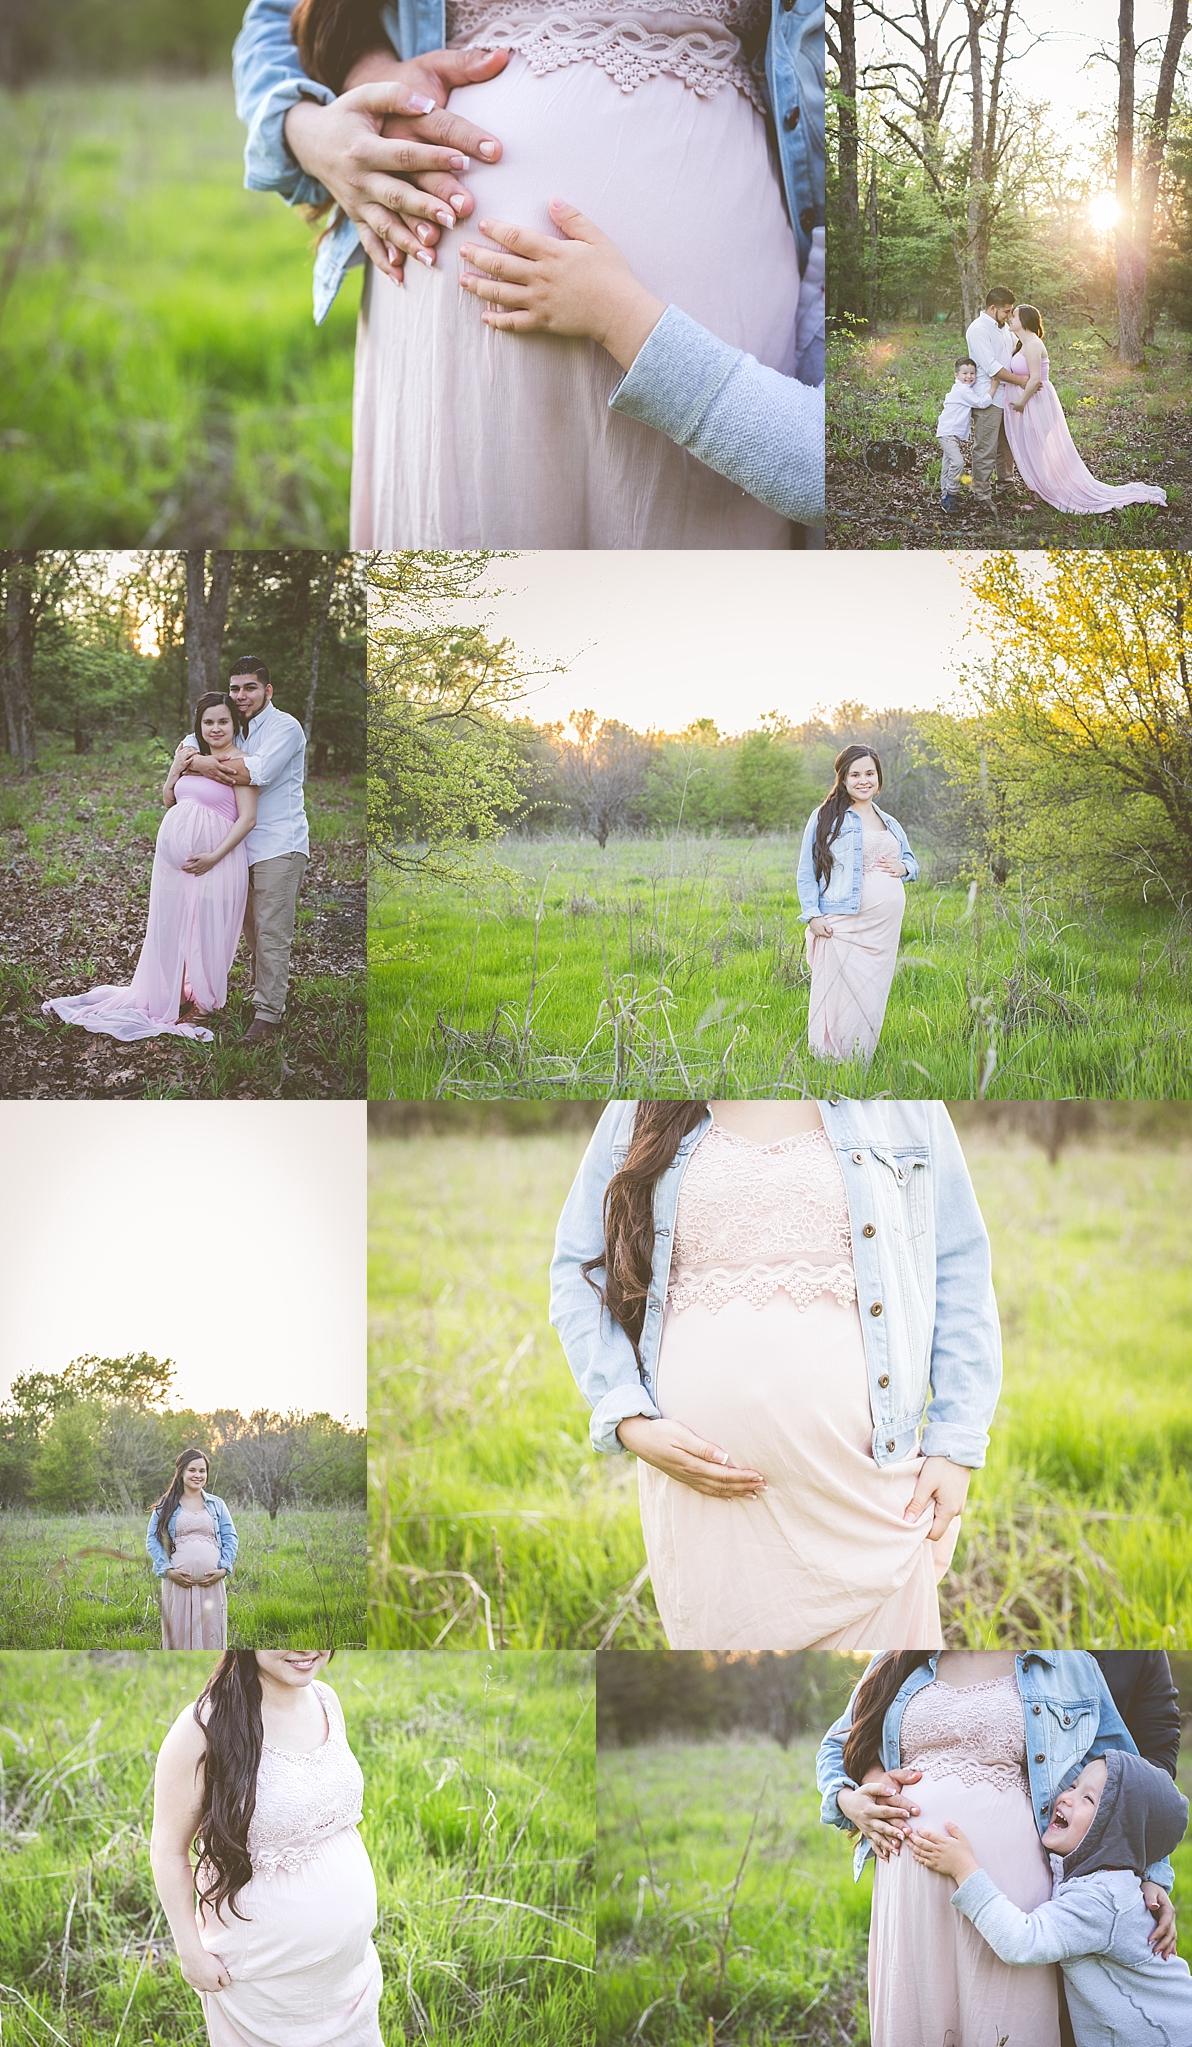 family-photo-camdenton-missouri-lake-ozark-osage-outdoor-baby-newborn-photos-maternity.jpg